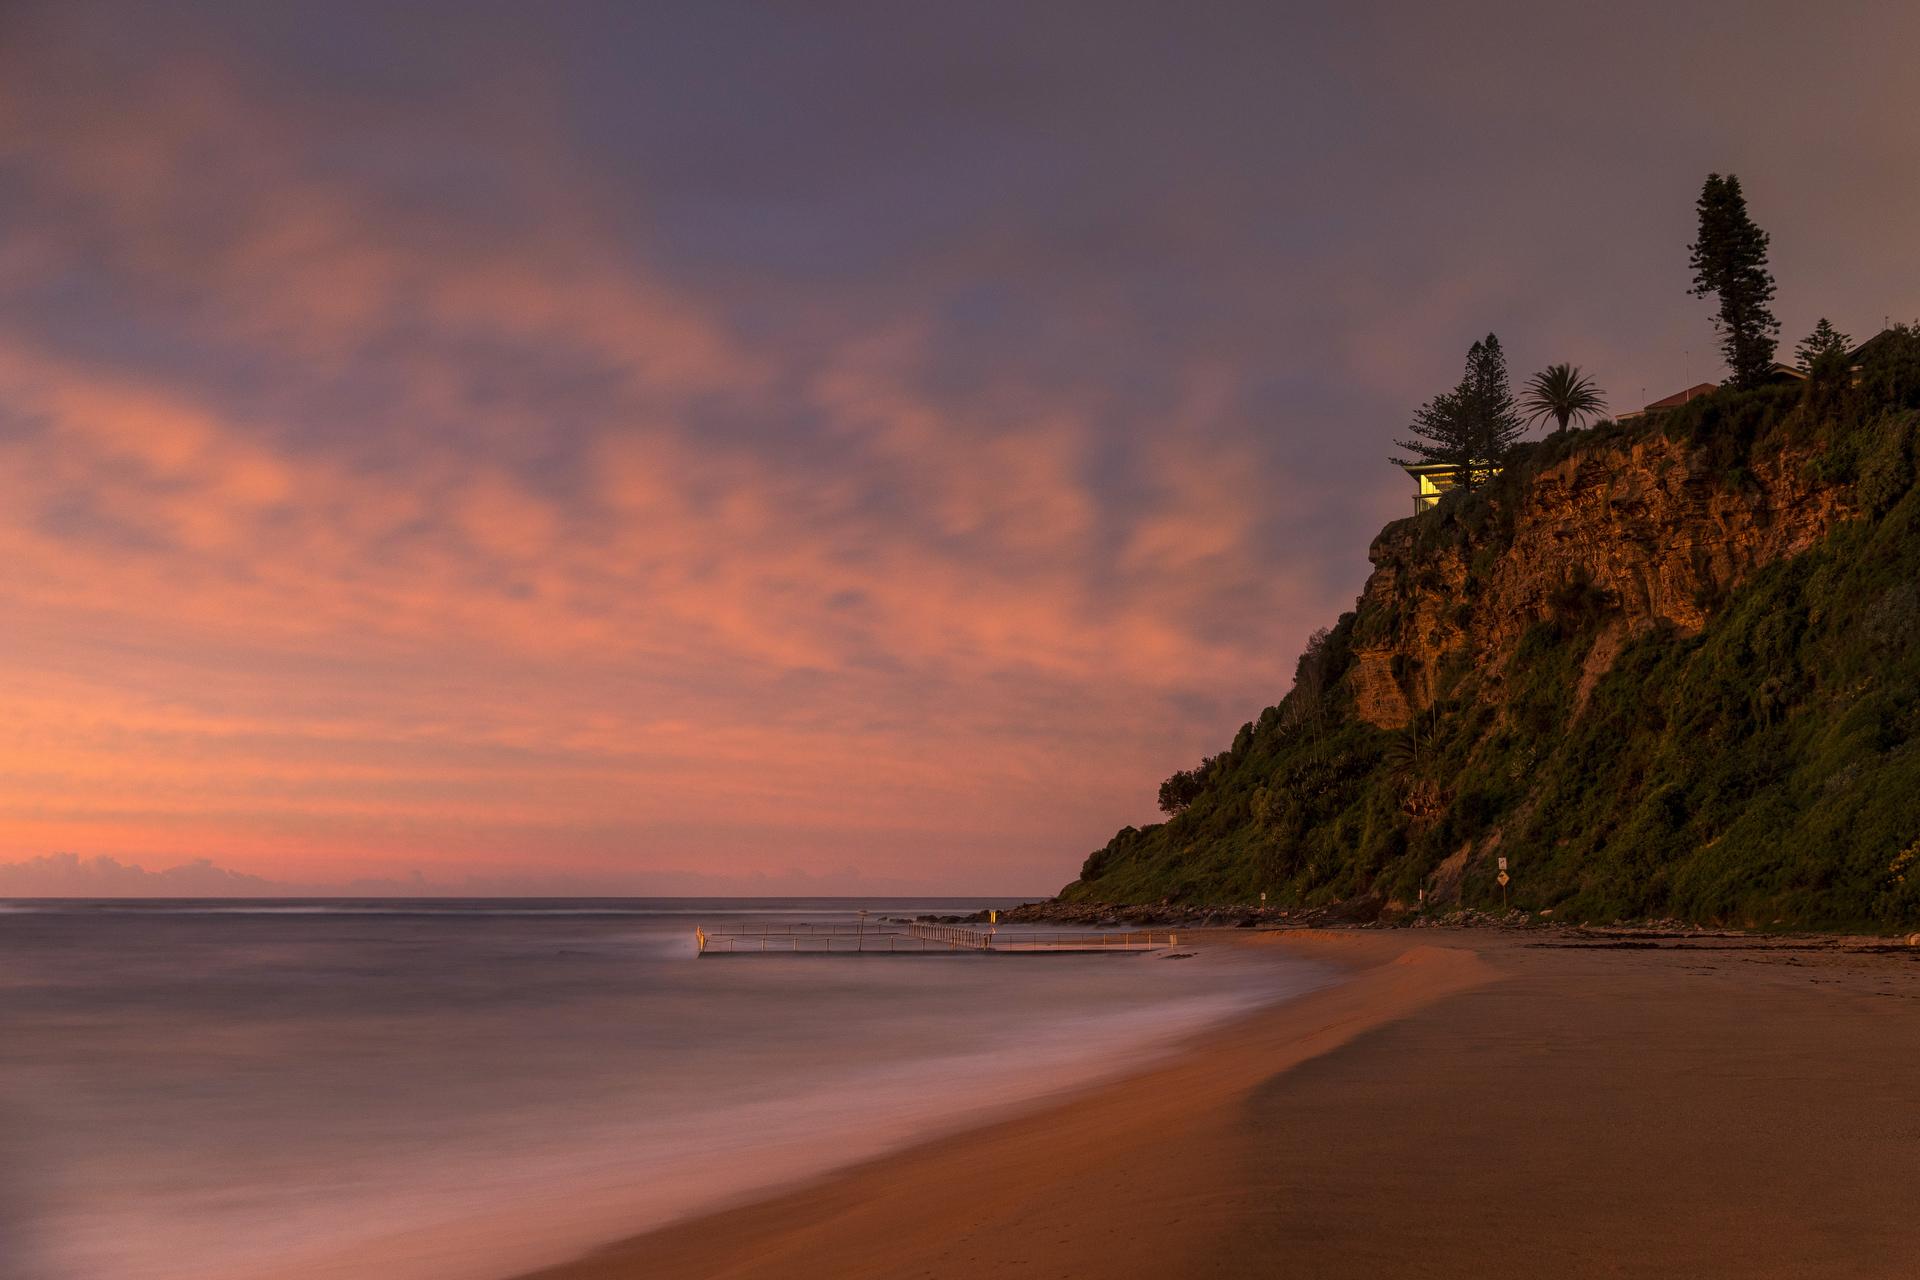 Sydney landscape photographer, sunrise, sunset, ocean, ocean pool, While you were sleeping, landscape, award winning, travel, NSW, Australia, sea, fine art prints, Newport, house